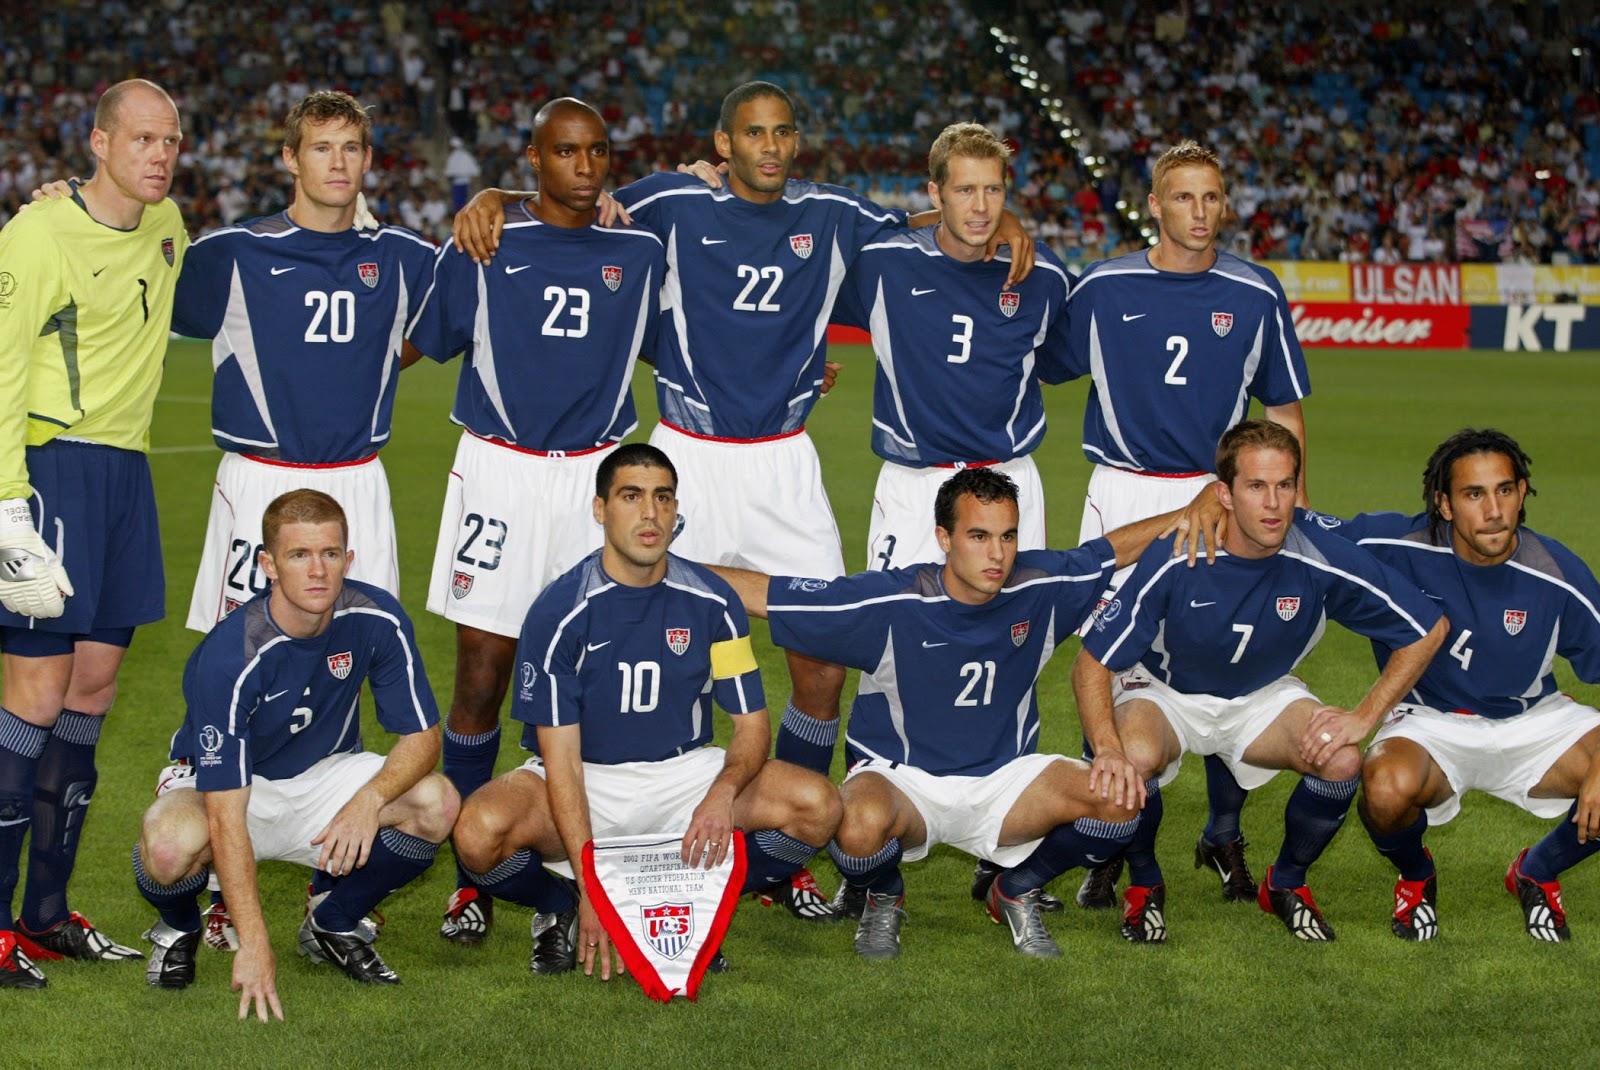 qu mens soccer team - HD1600×1070